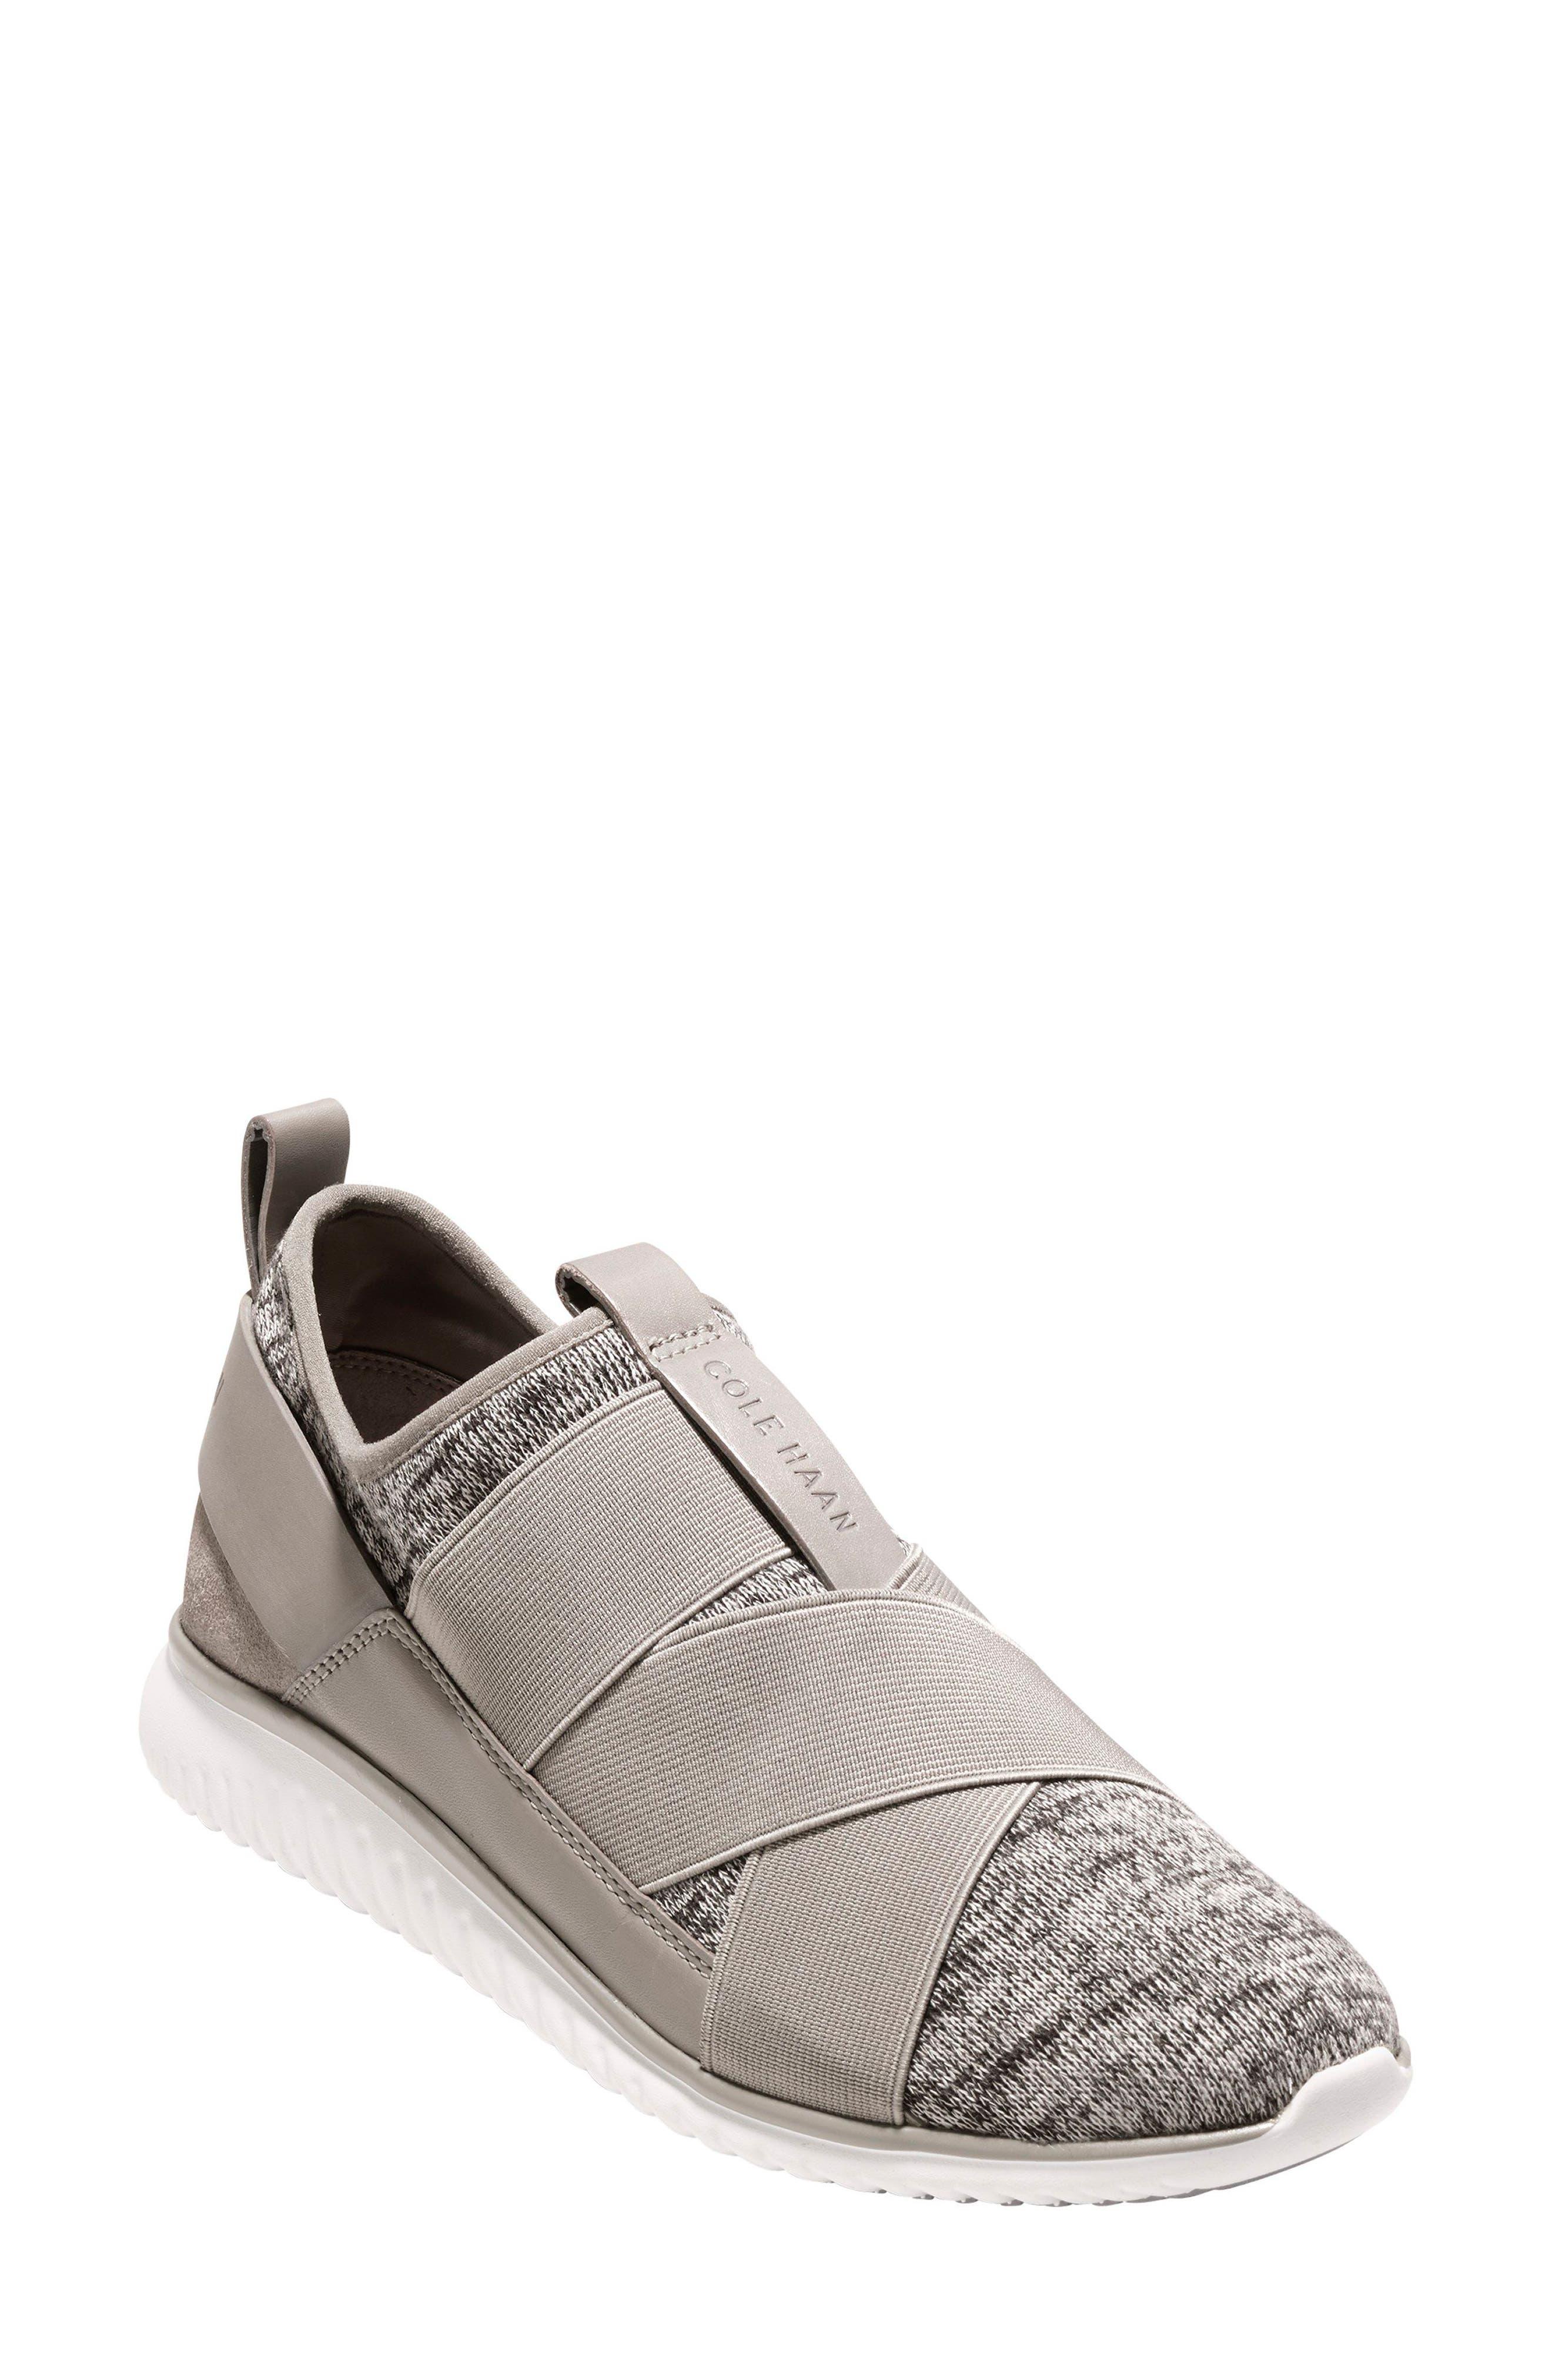 'StudioGrand' Sneaker,                             Main thumbnail 1, color,                             Rockridge/ Pumice Stone Fabric